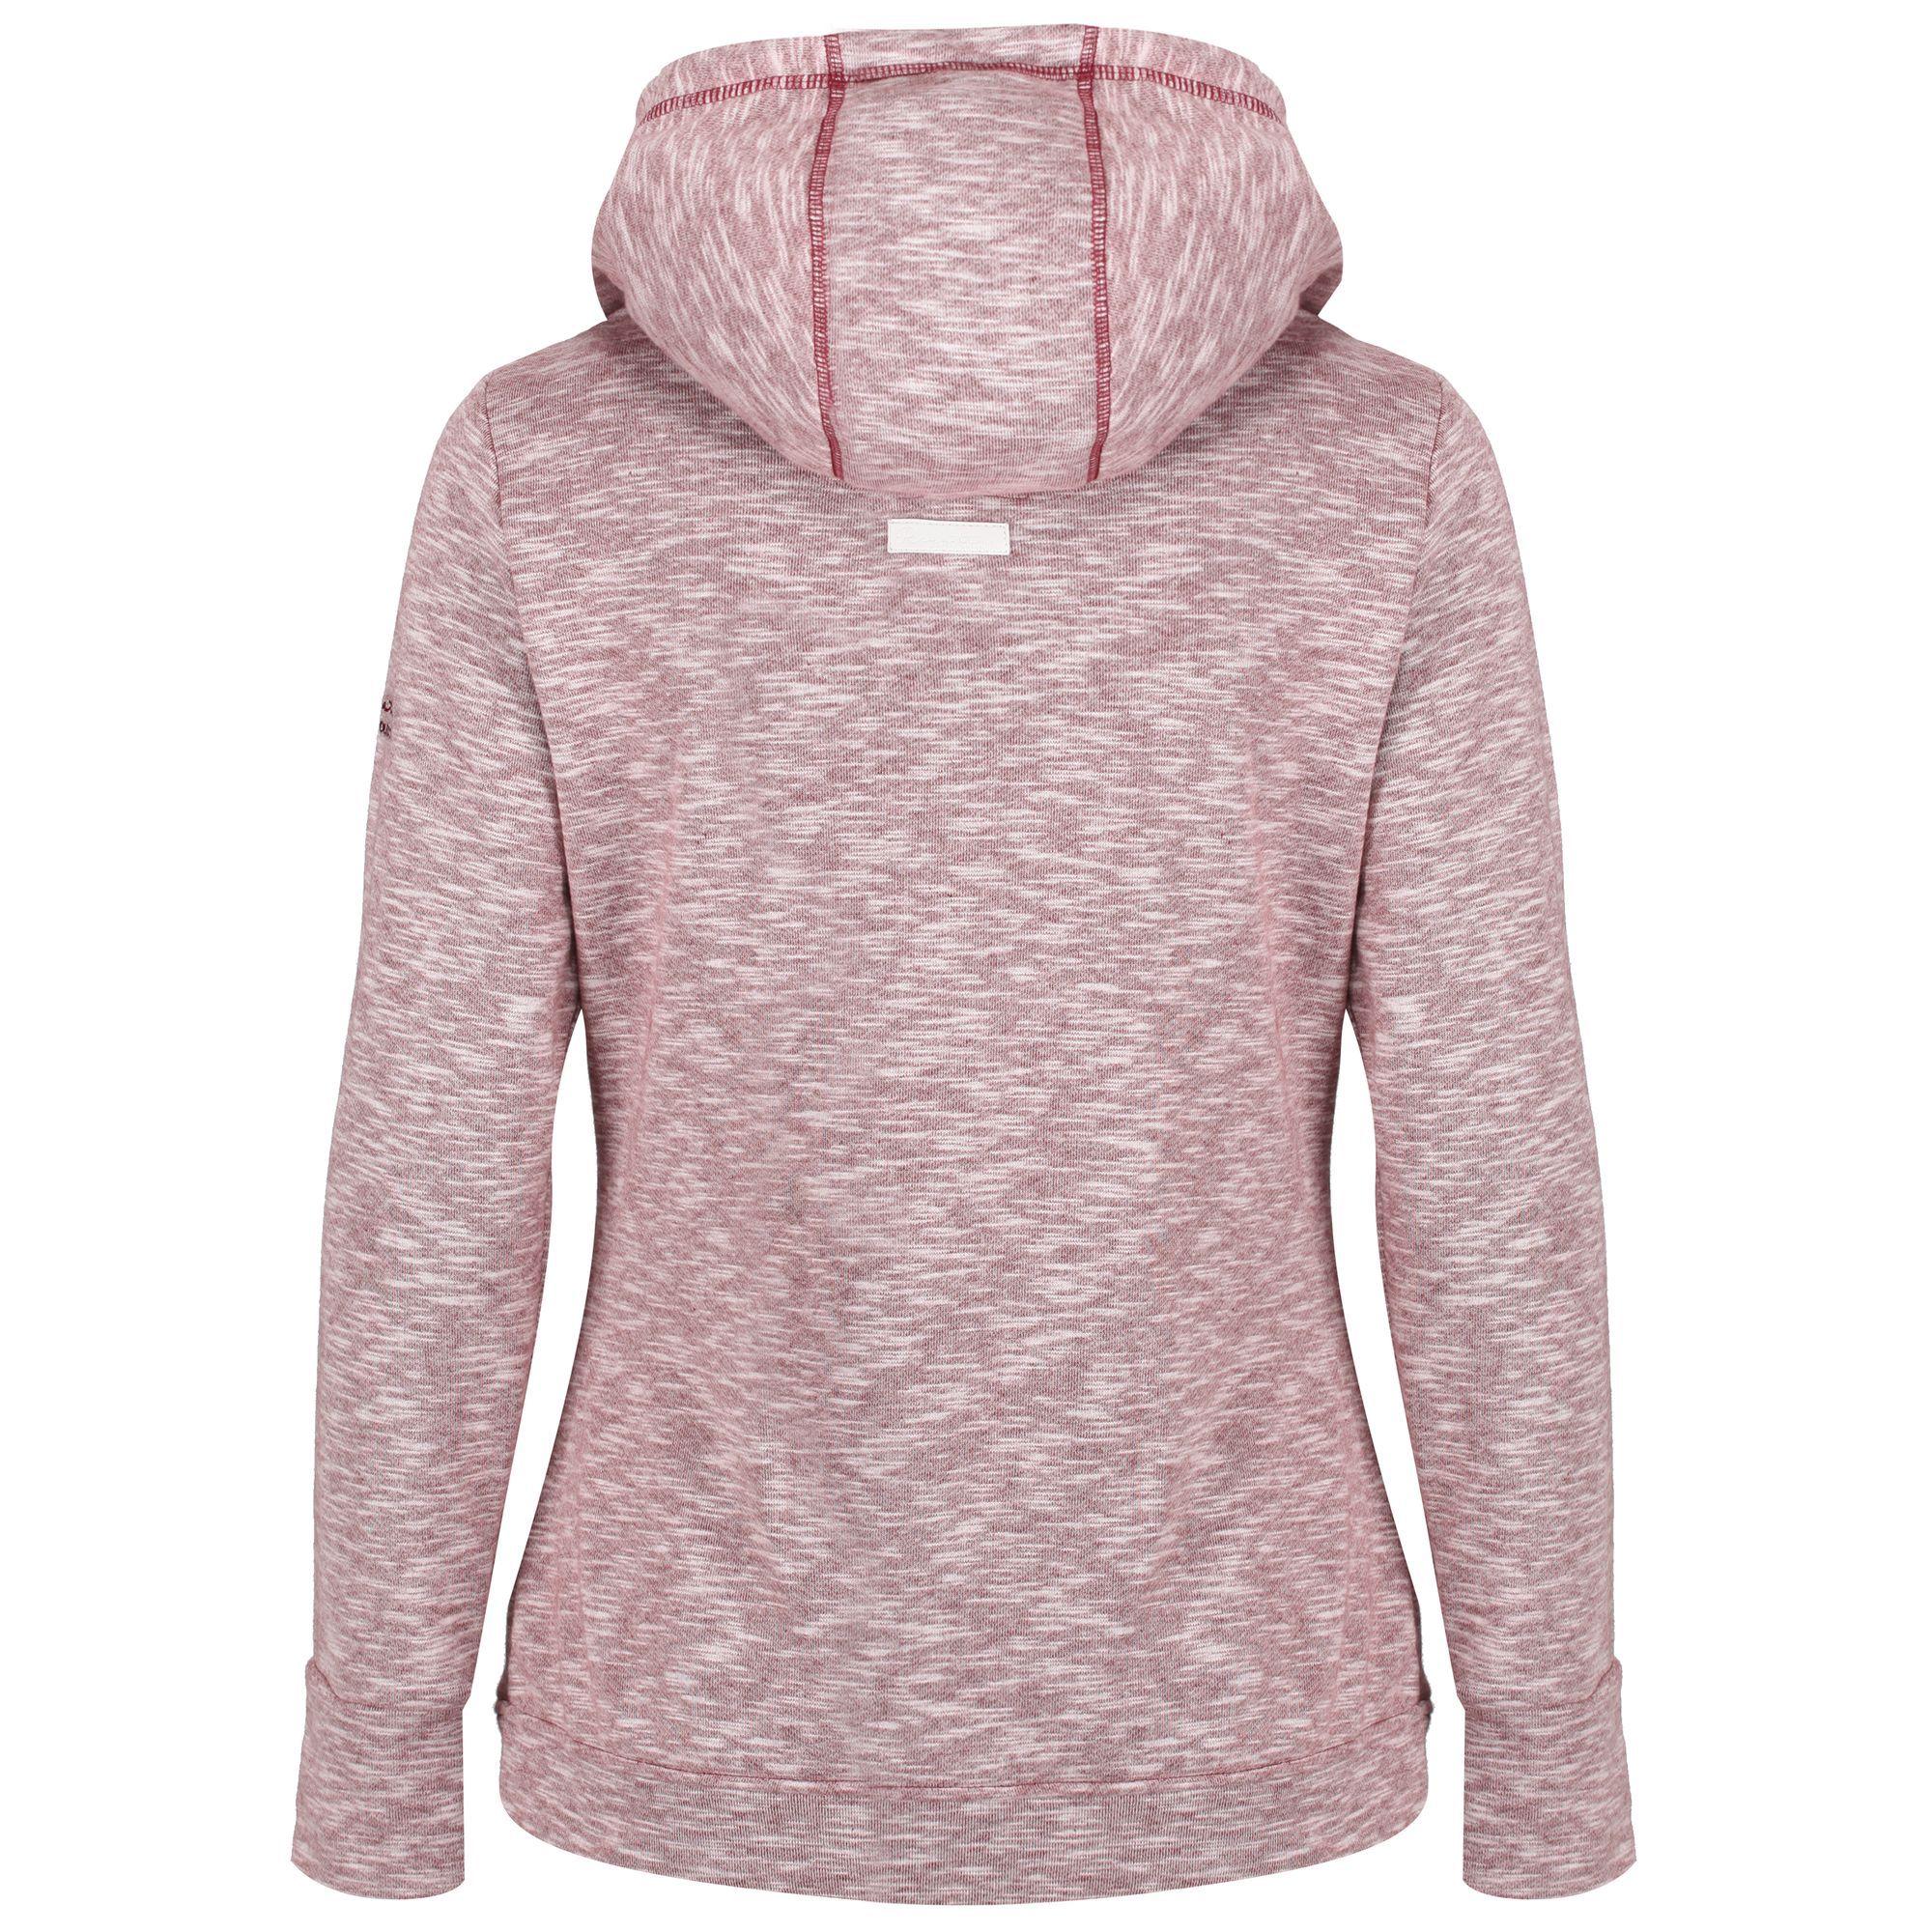 Regatta-Ramosa-Womens-Full-Zip-Hoodie-Hooded-Fleece-Jacket-RRP-50 thumbnail 5